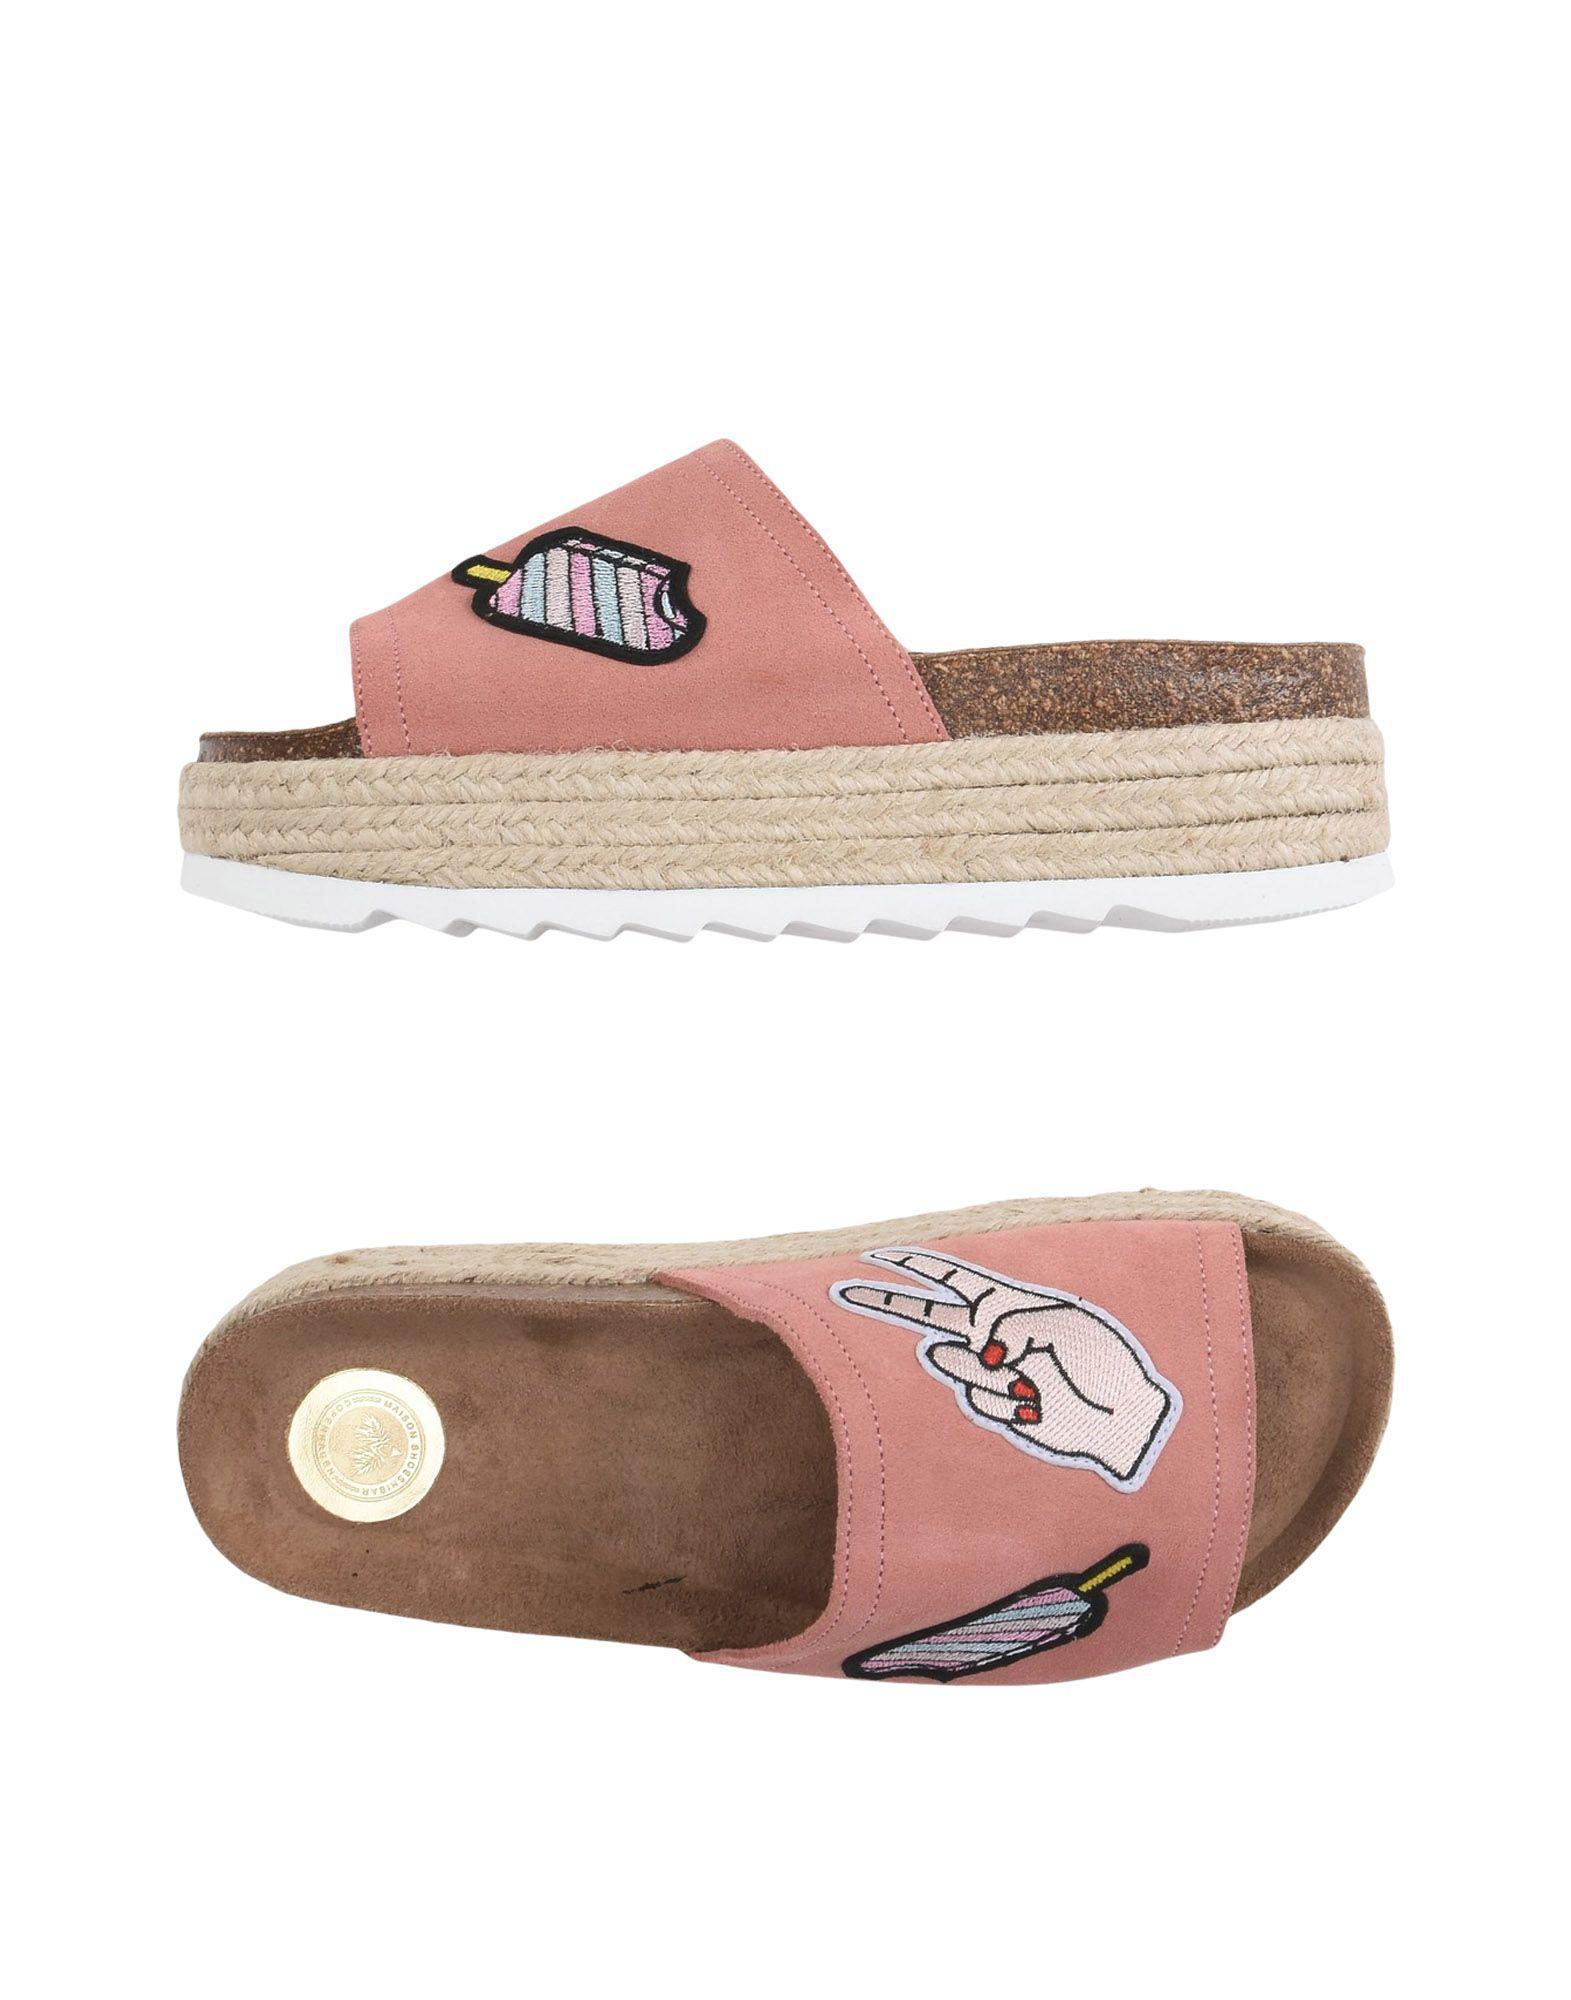 In Pink Lyst Maison Sandals Shoeshibar 7qBEO